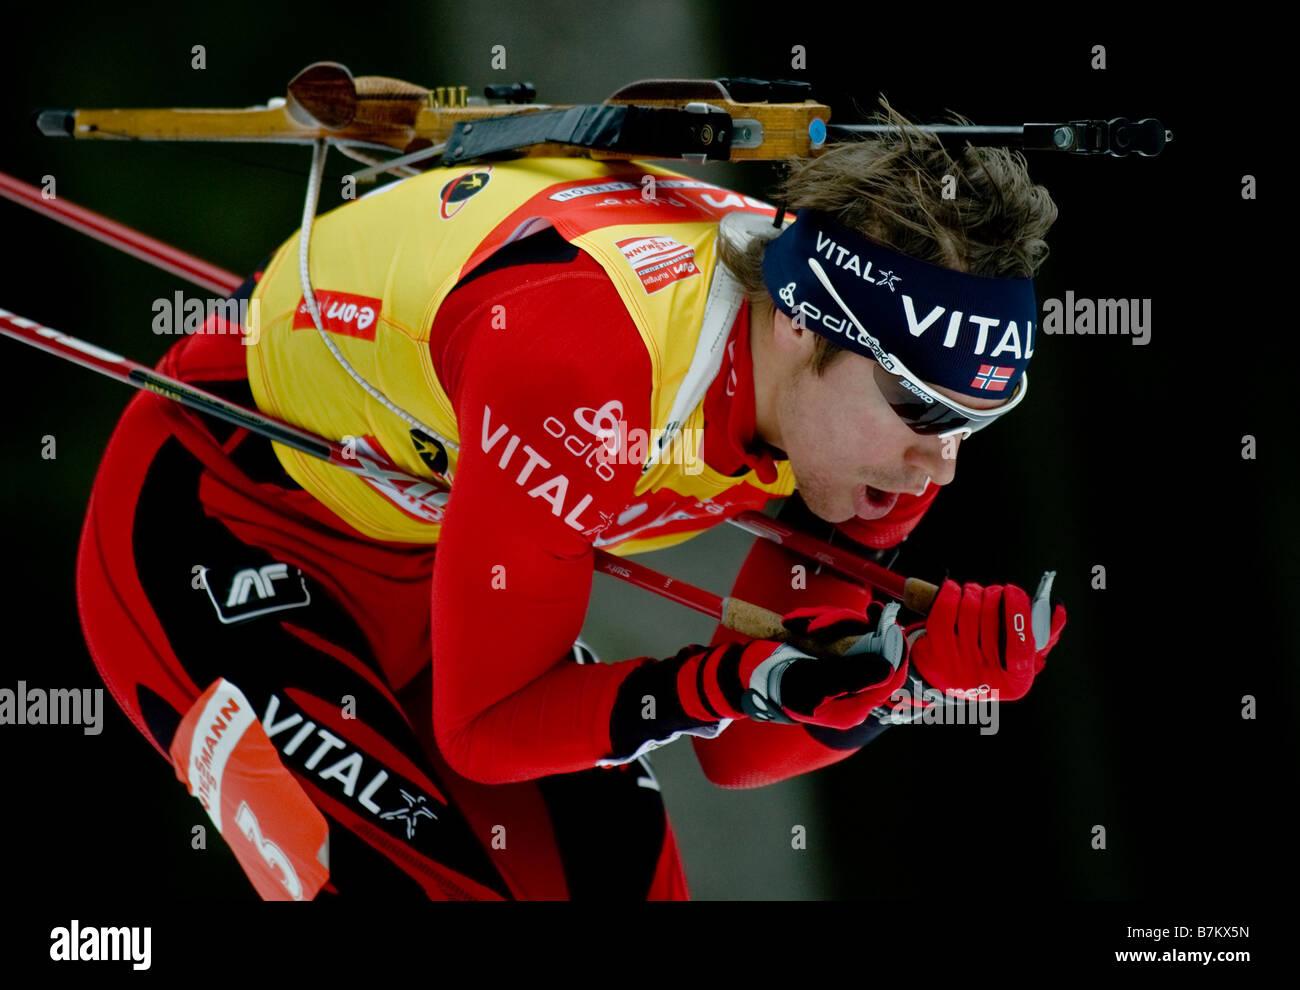 SVENDSEN Emil Hegle Norwegen Biathlon Weltcup Verfolgung Frauen Männer Ruhpolding 18 1 2009 - Stock Image